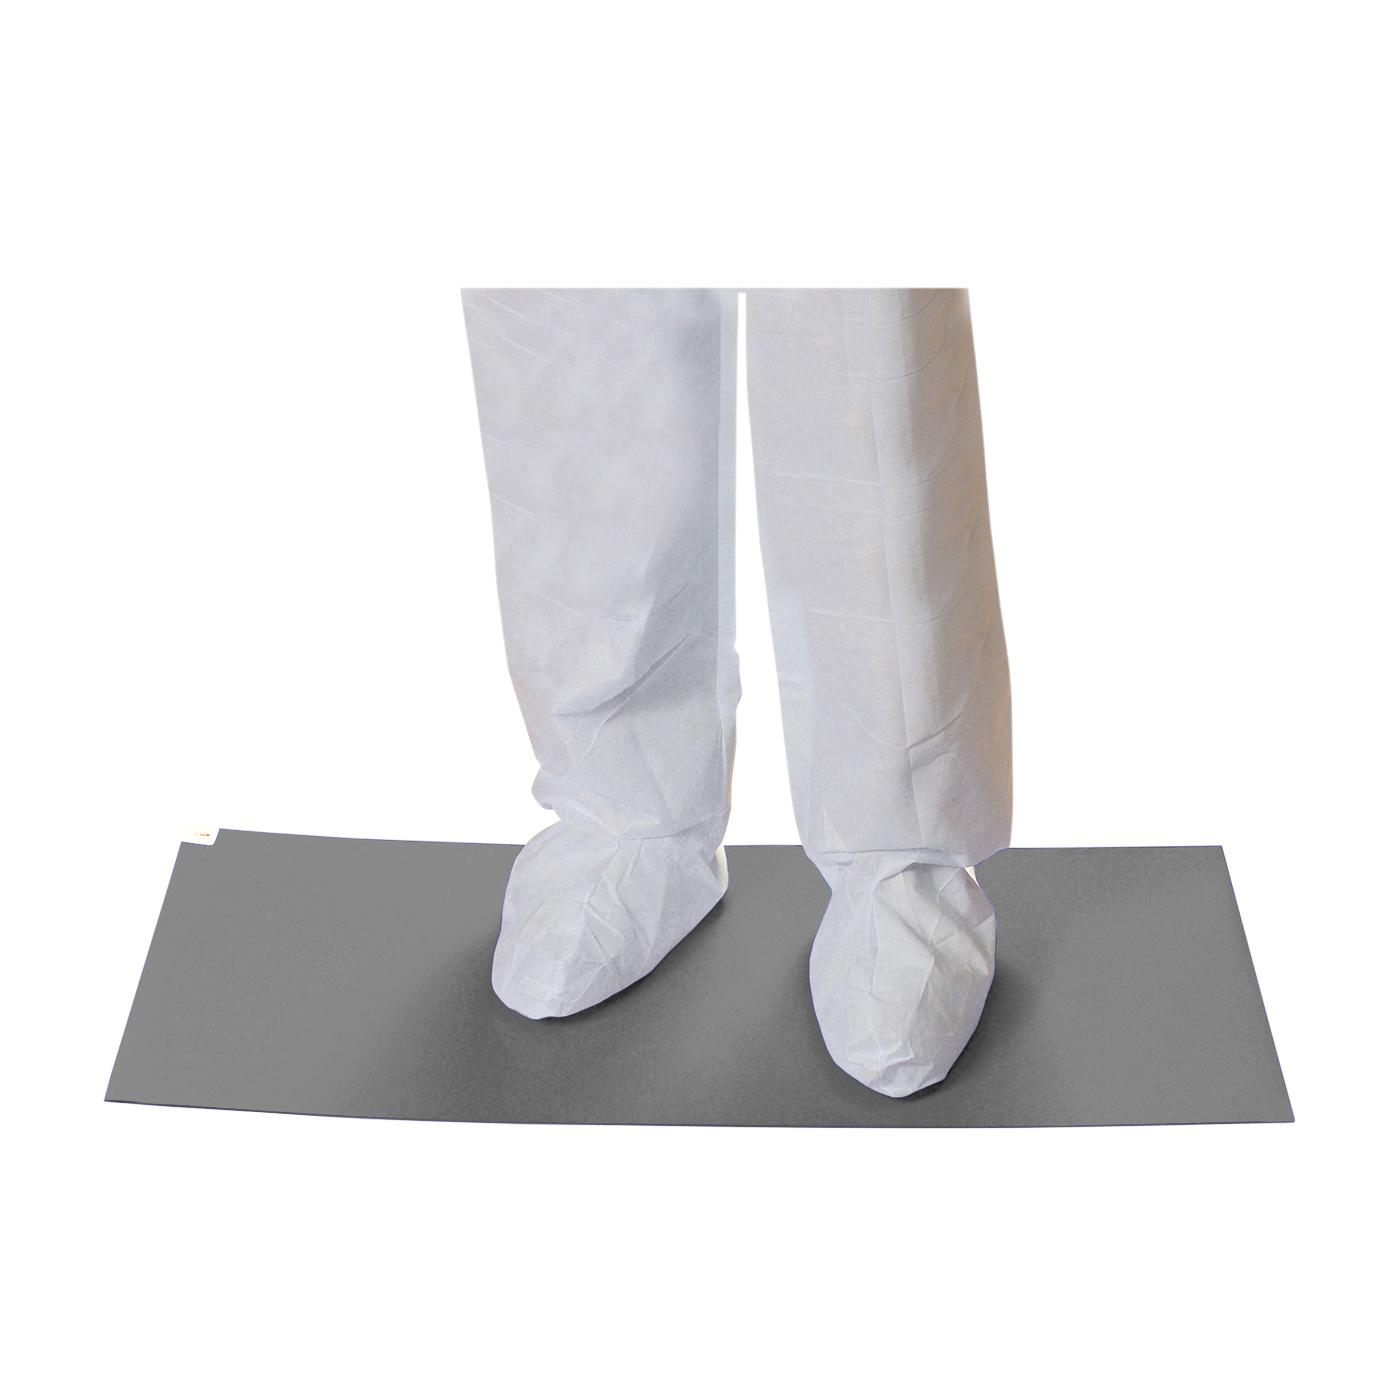 PIP® CleanTeam® 100-93-183638G Contamination Control Mat, 36 in L x 18 in W x 0.05 mm THK, Gray, Polyethylene